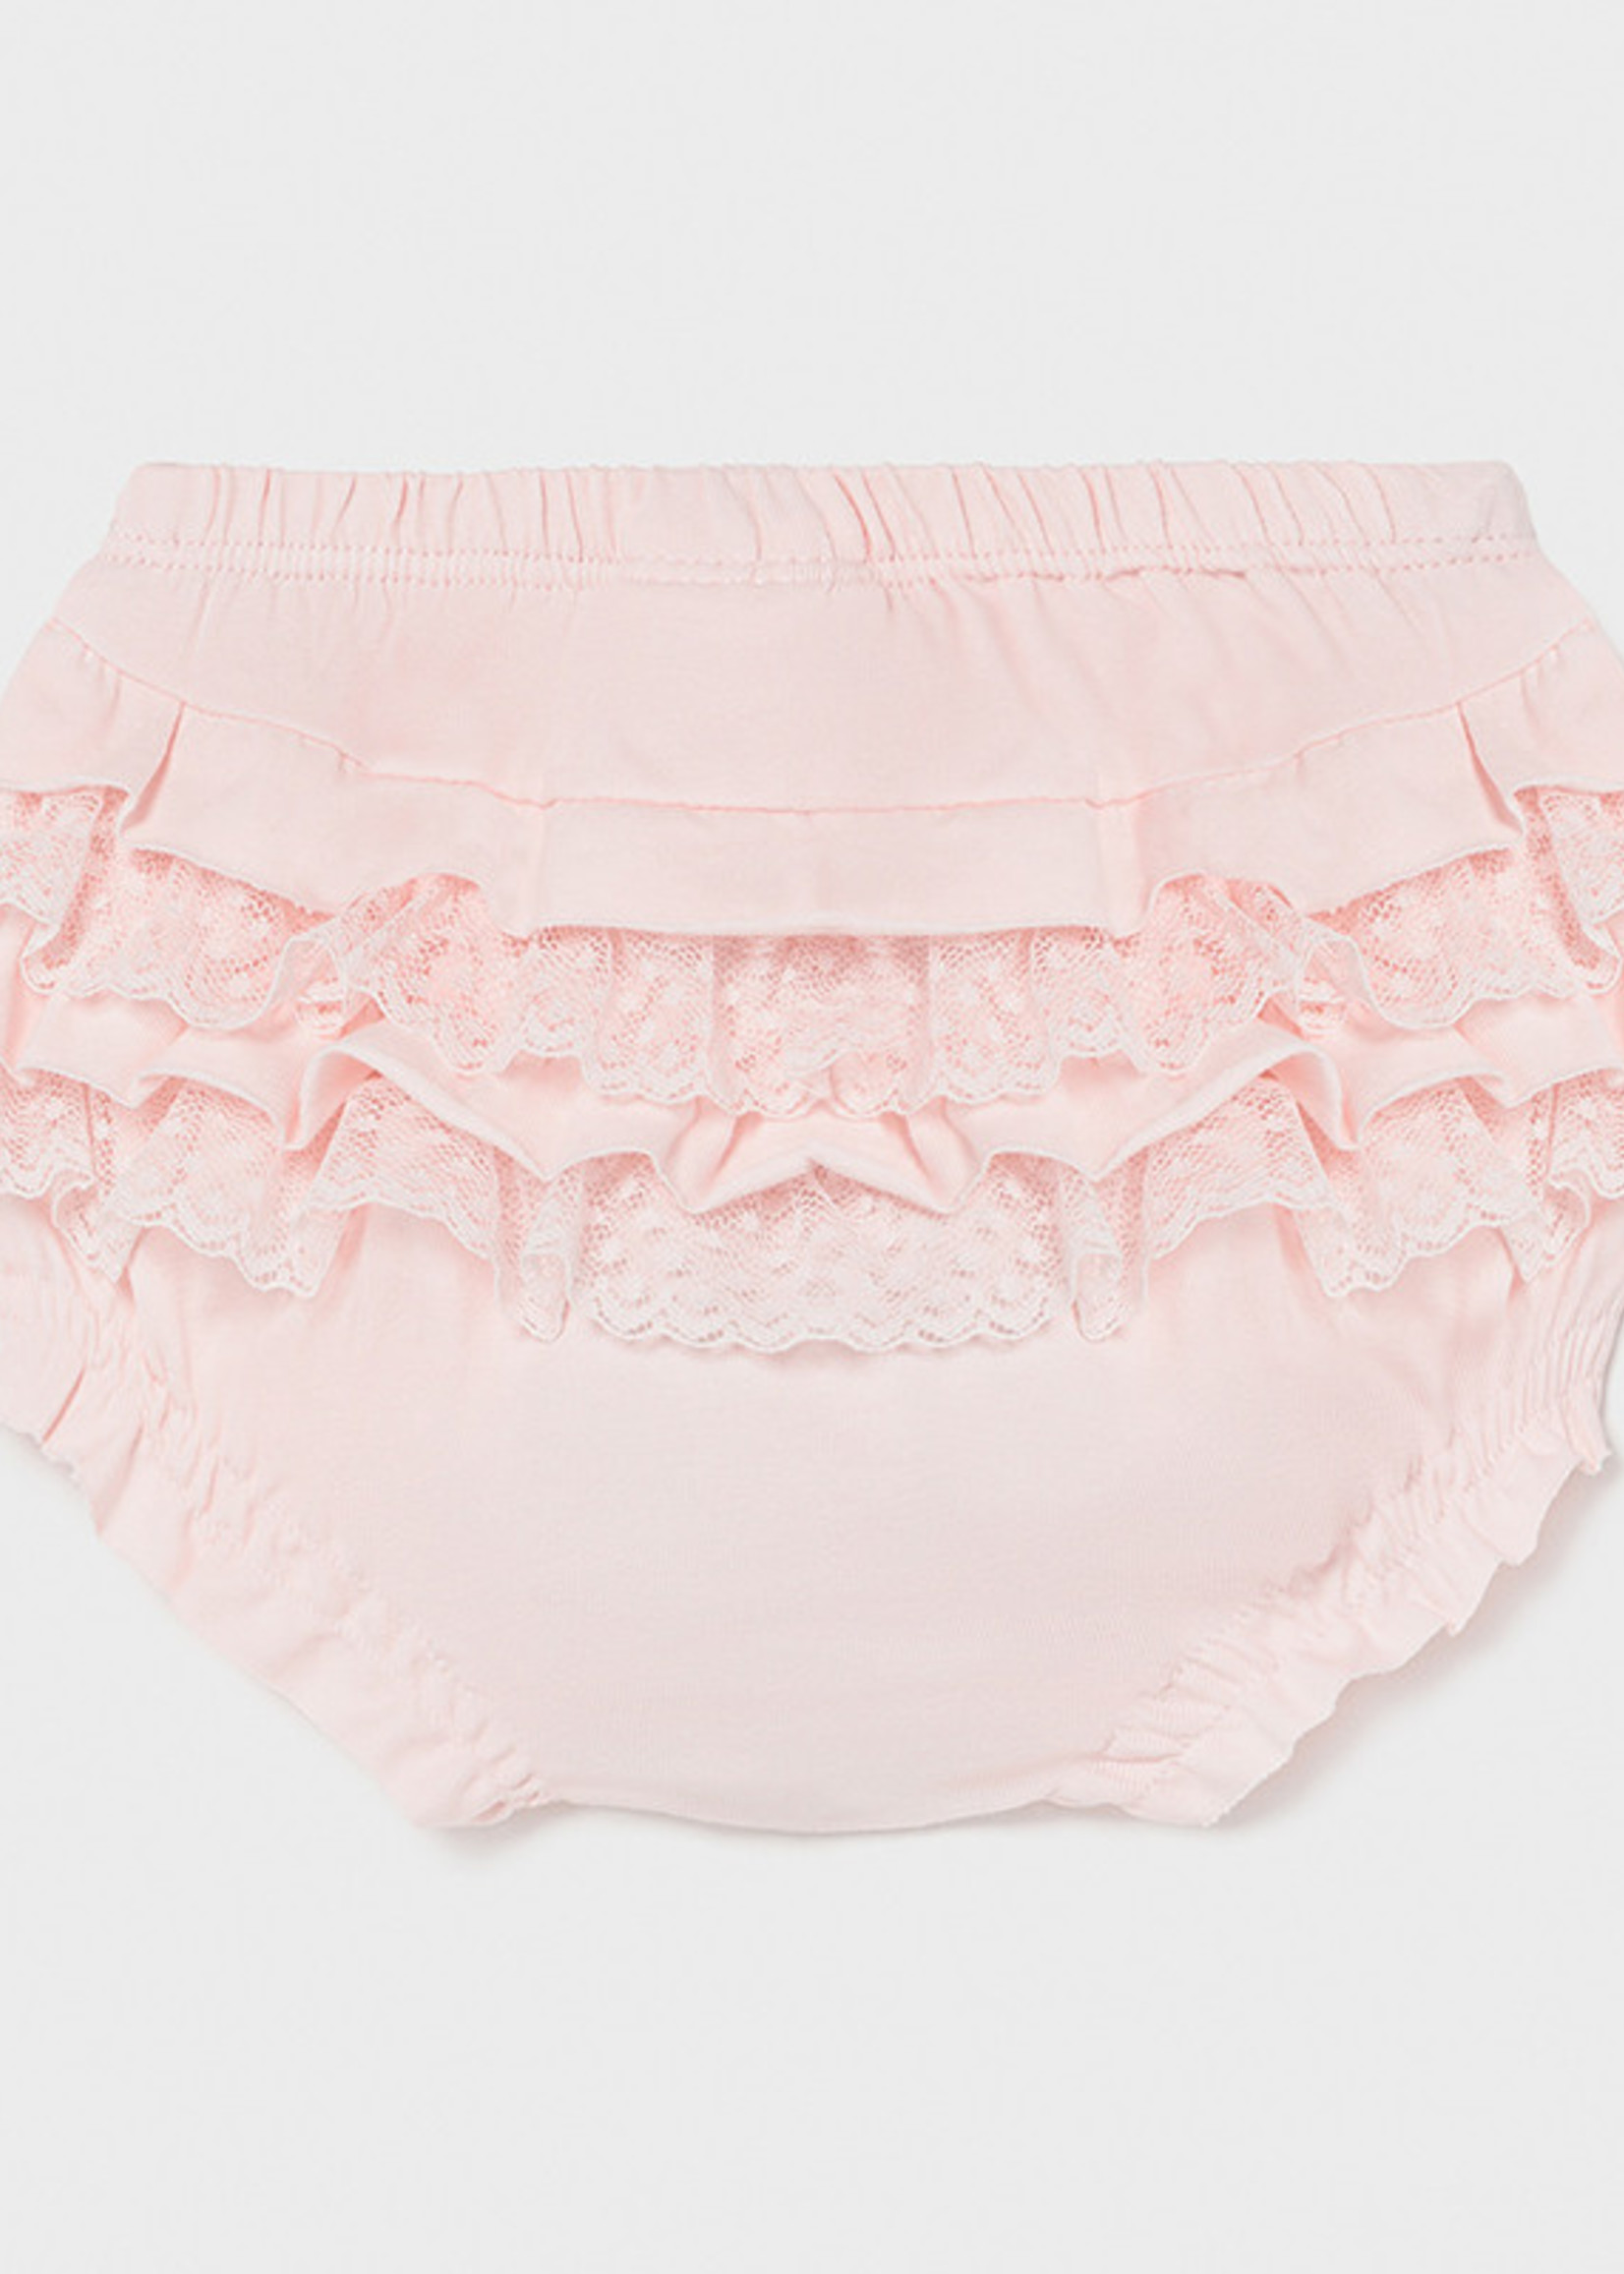 Mayoral Mayoral panties baby rose